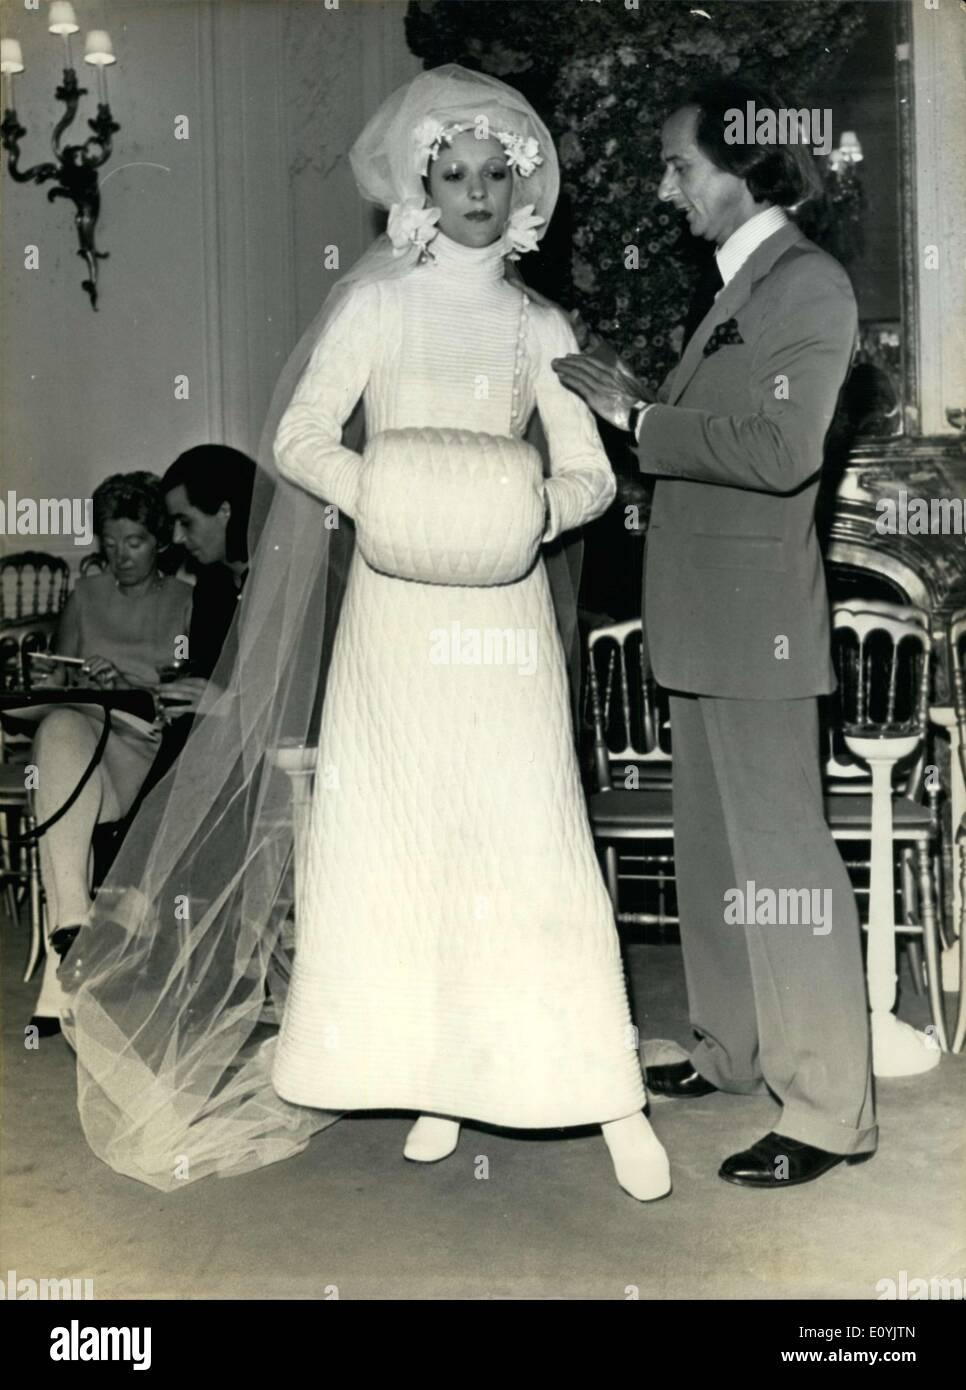 Jul. 23, 1970 - Model in Christian Dior Wedding Gown by Marc Bohan ...